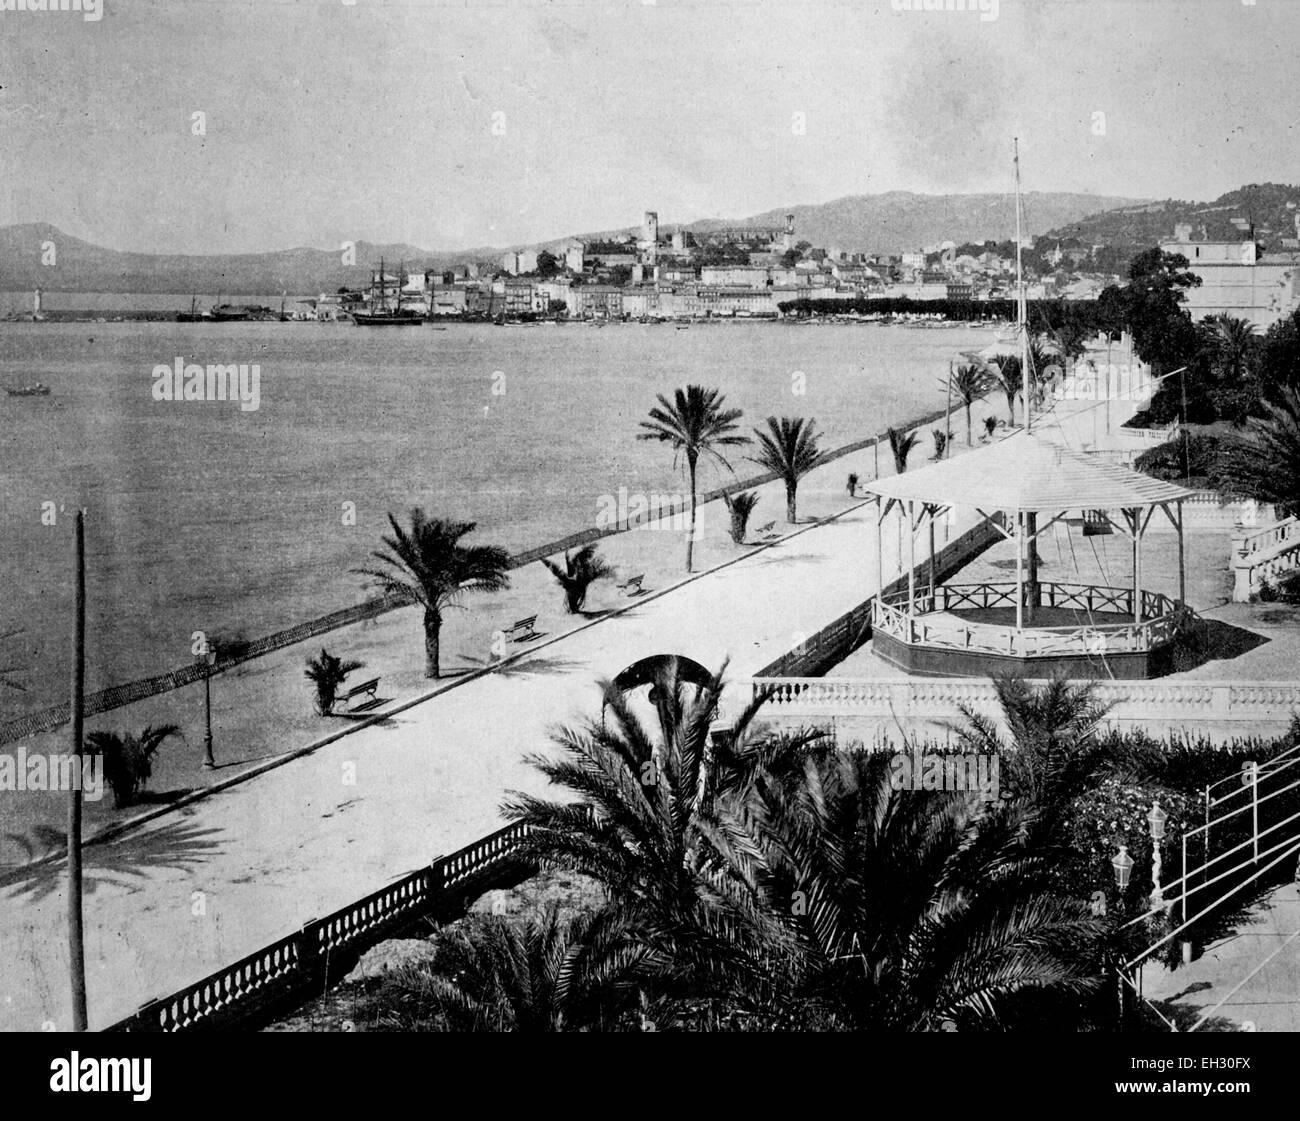 Early autotype Cannes, Cote d'Azur, France, 1880 - Stock Image